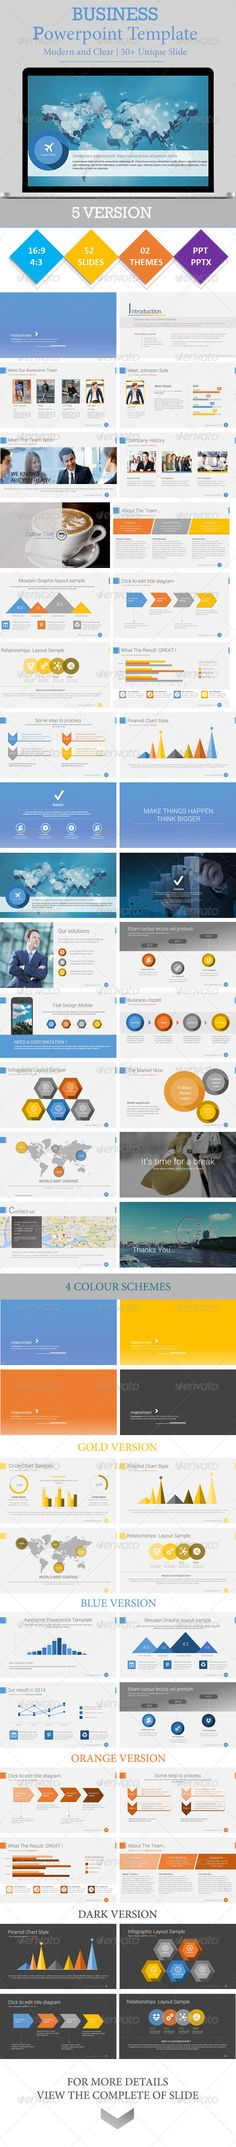 BUSINESS - Powerpoint Presentation Template